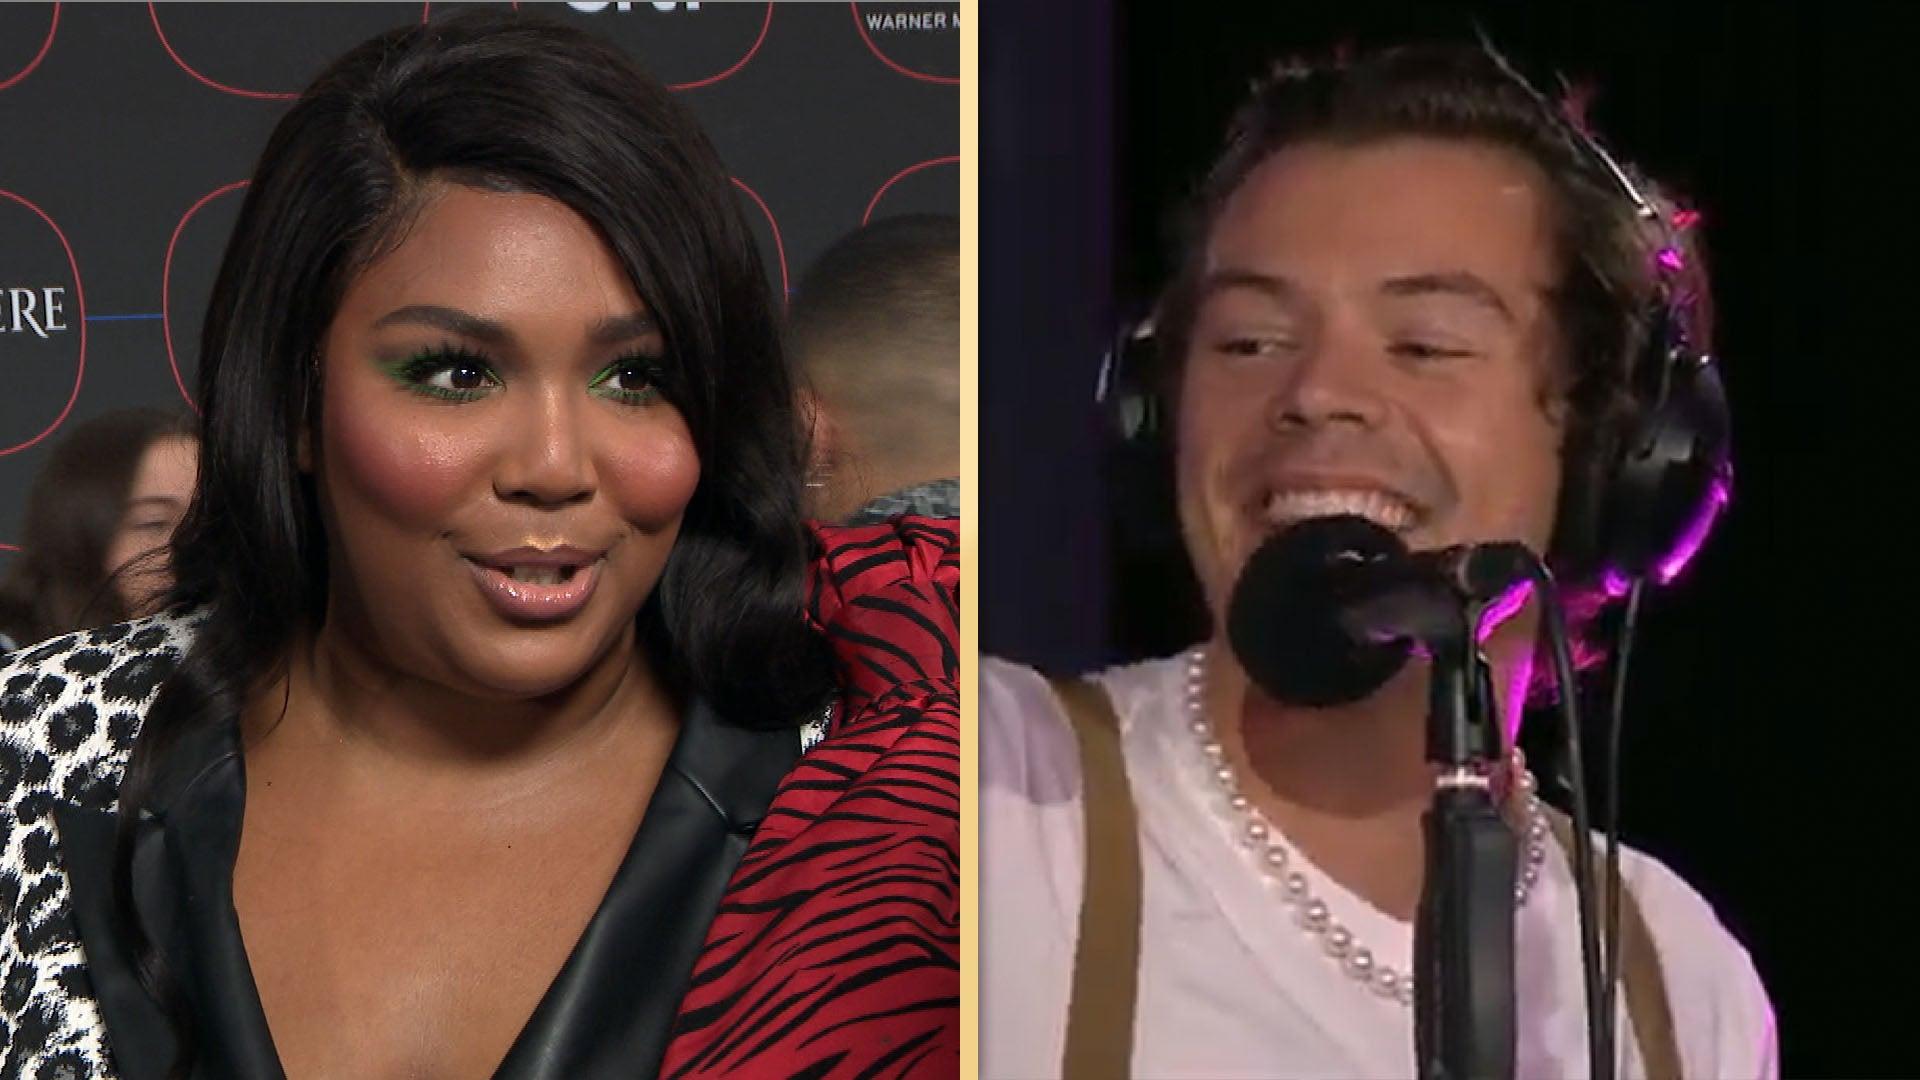 Harry Styles Covers Lizzo's 'Juice' on BBC Radio and it's AMAZING!